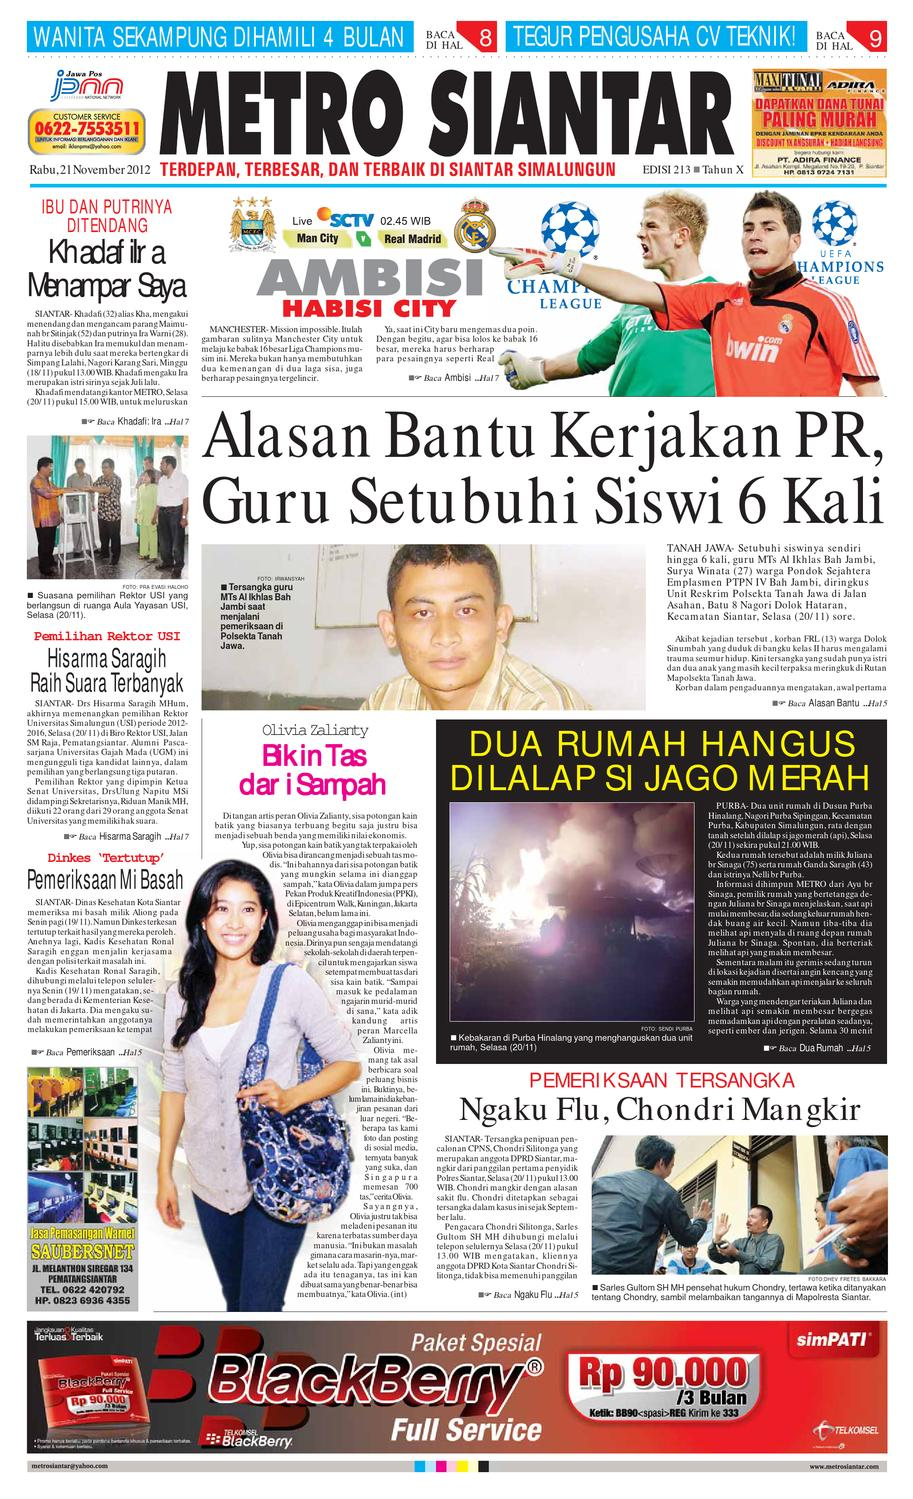 Epaper Metro Siantar By Issuu Produk Ukm Bumn Batik Lengan Panjang Parang Toko Ngremboko